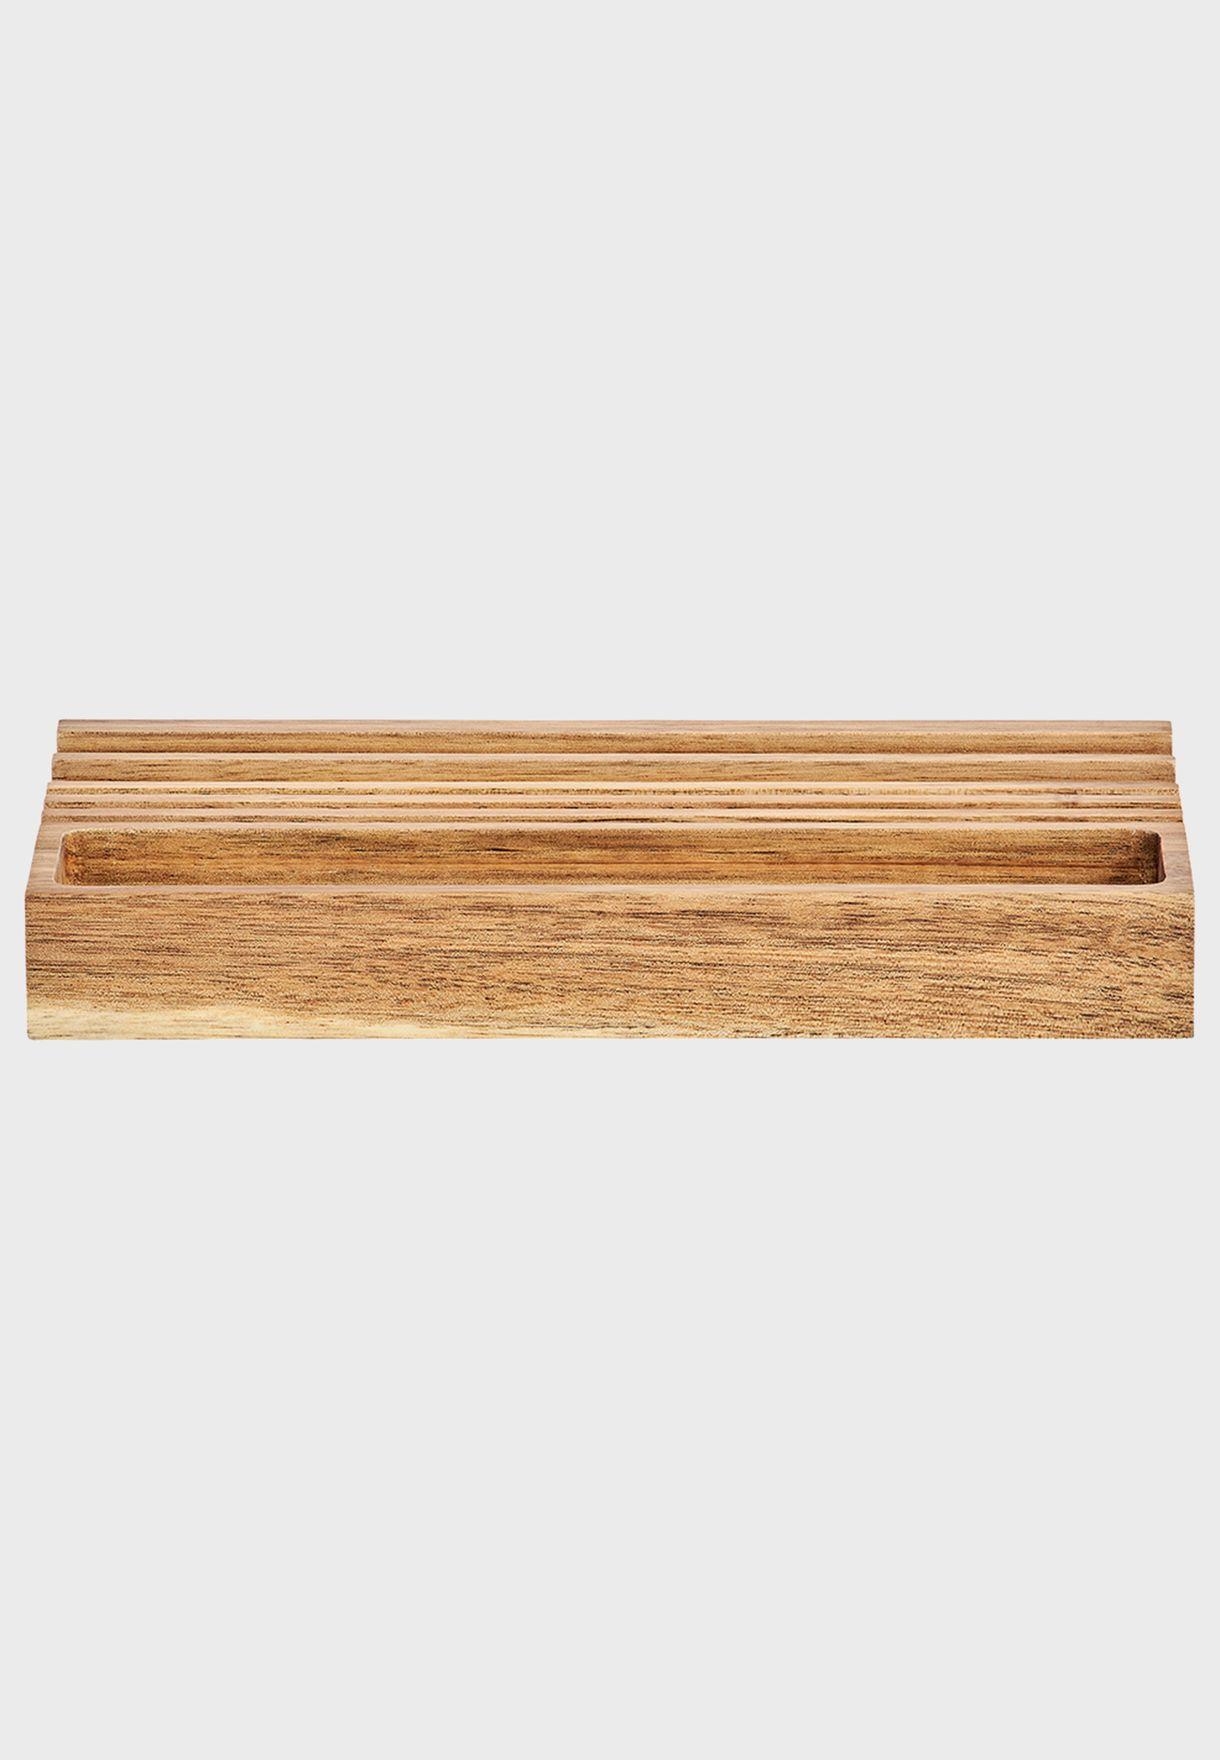 Wooden Desk Stationary